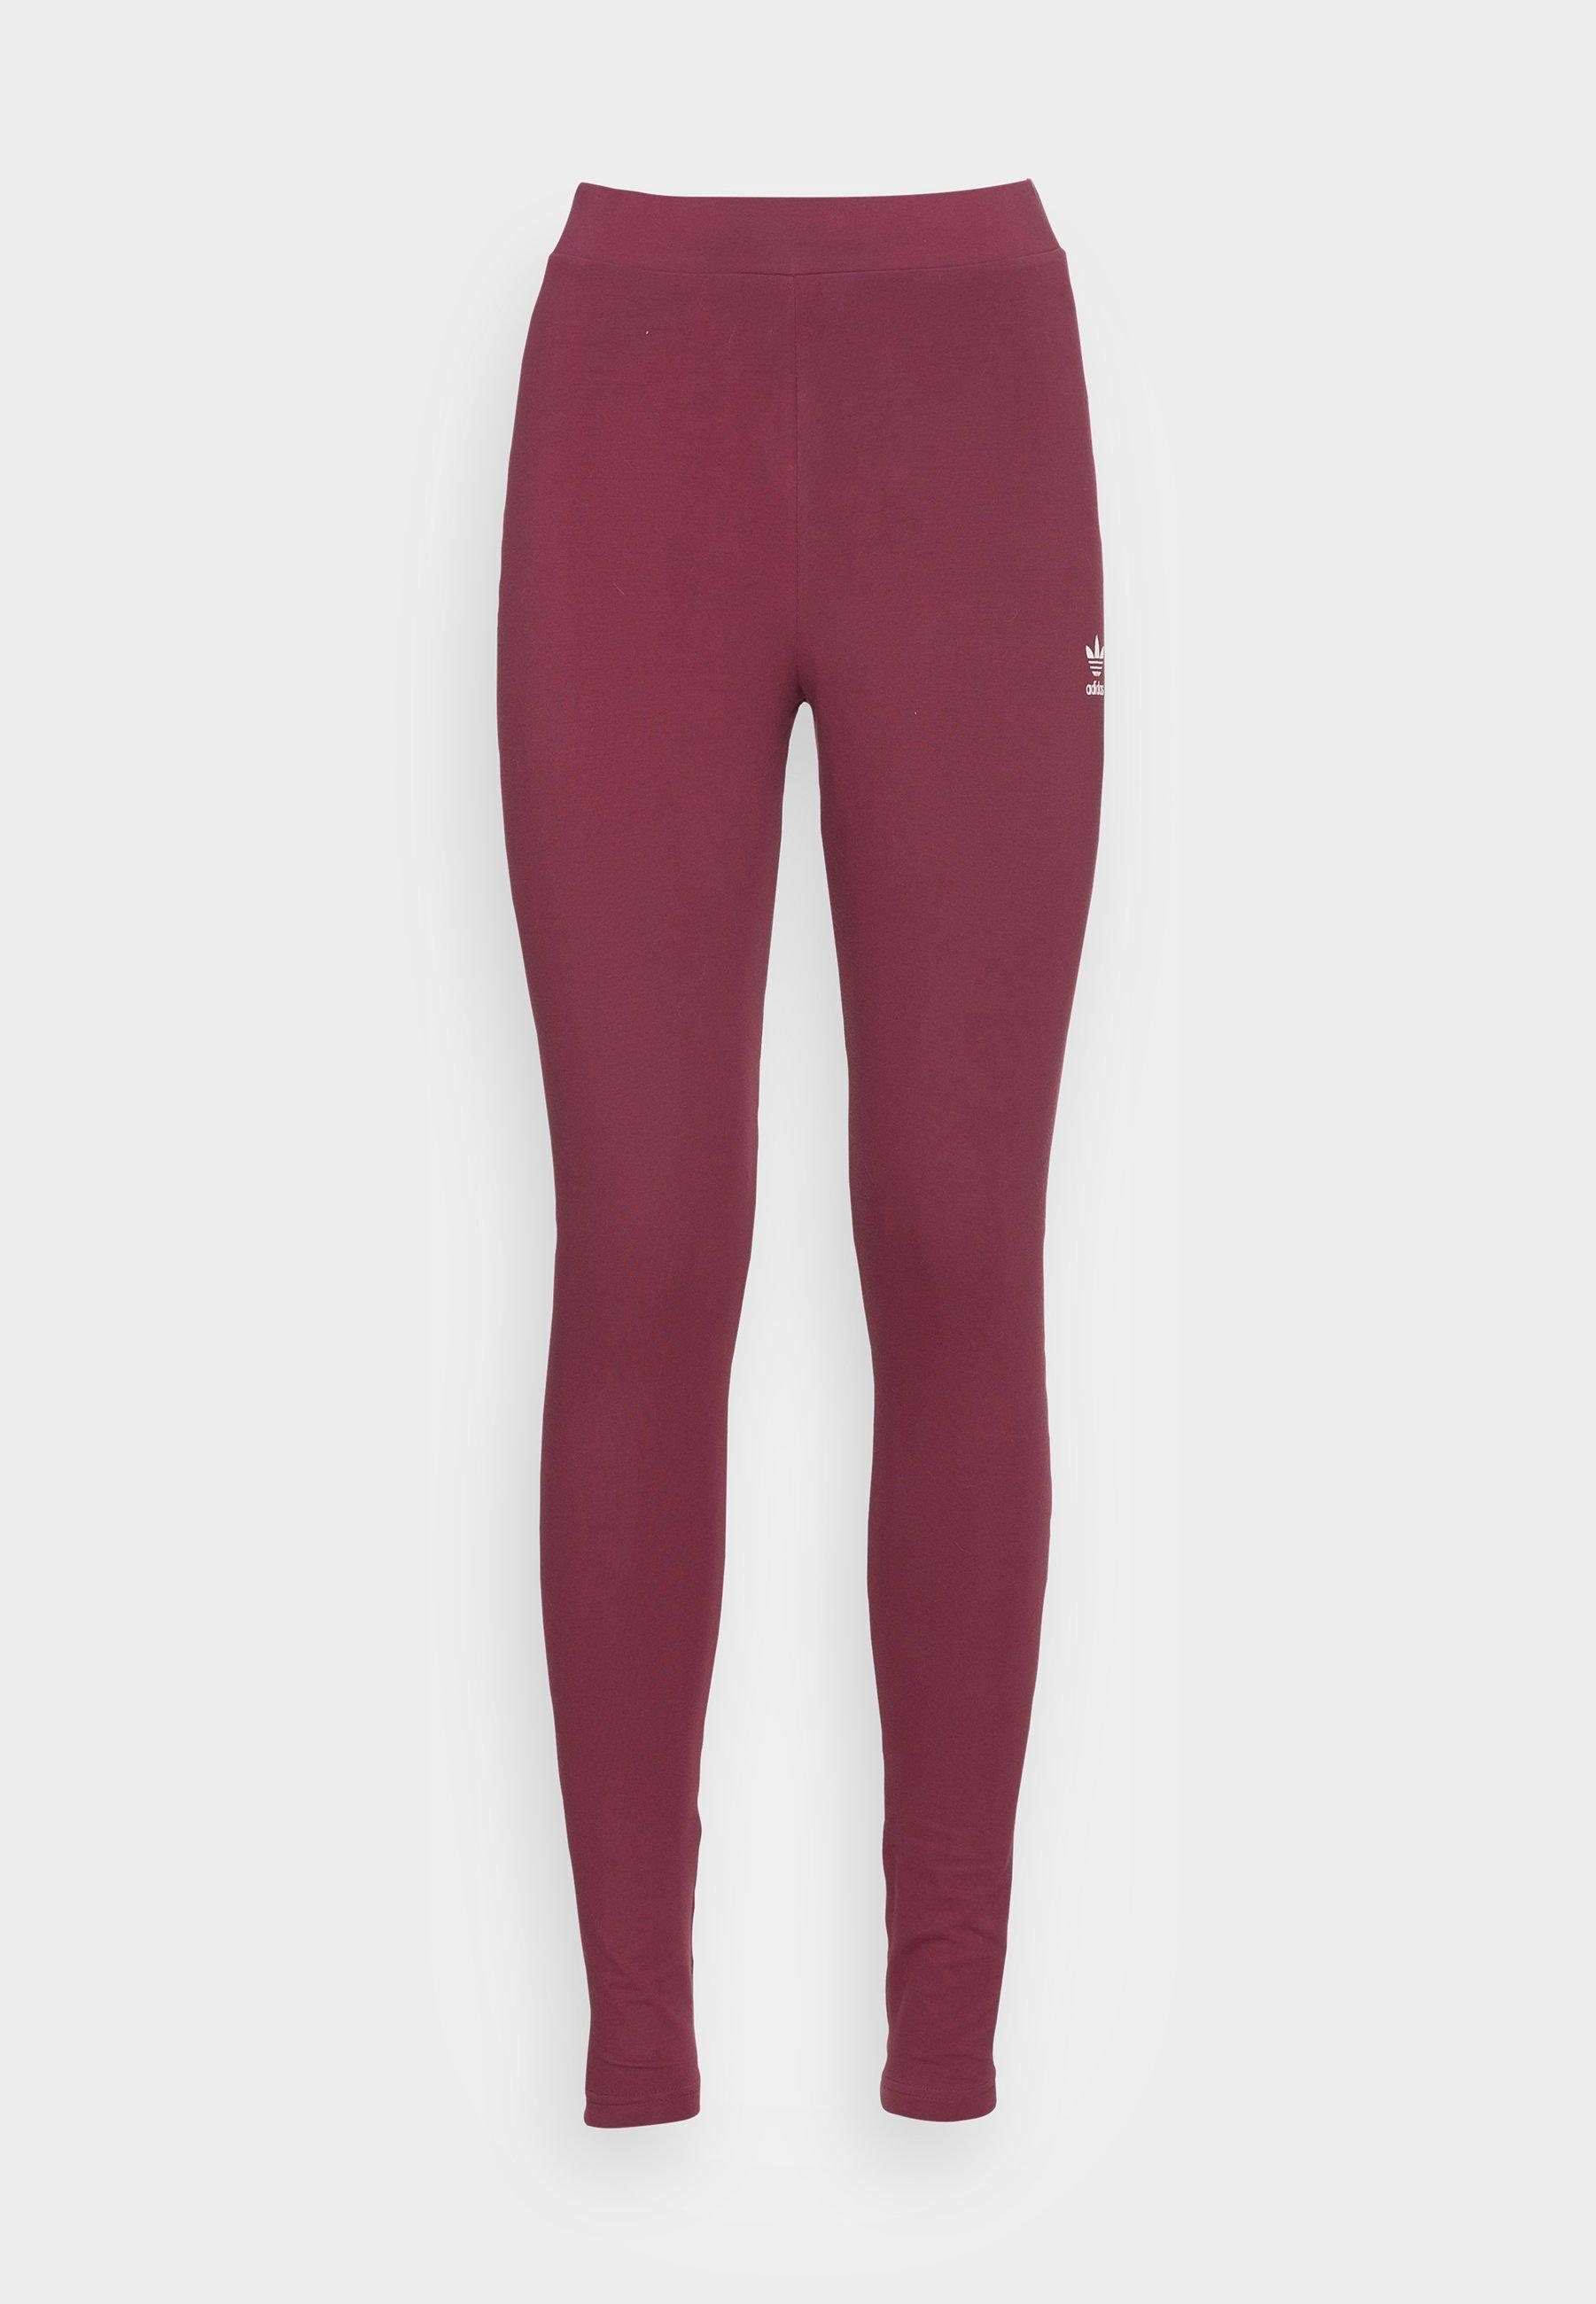 Women TIGHT - Leggings - Trousers